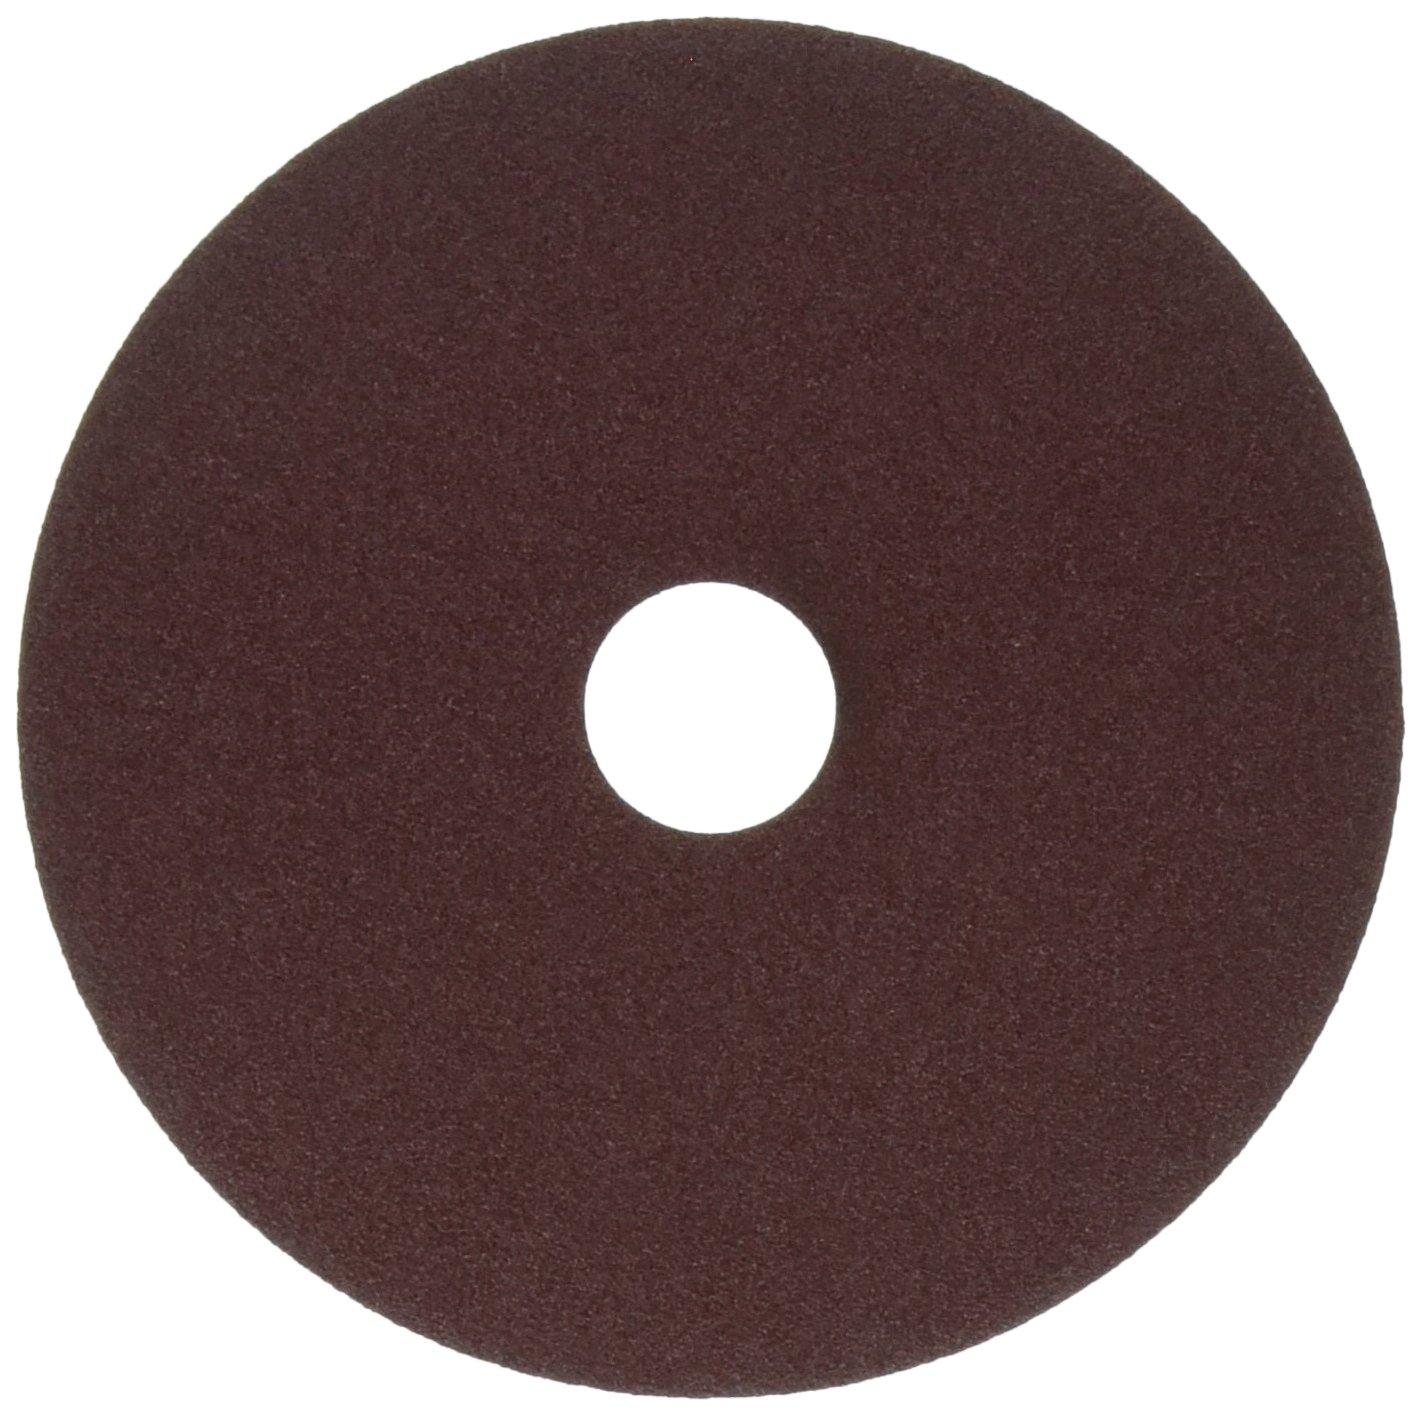 100 Pack United Abrasives-SAIT 53100 SAIT Fiber Disc 2A 5 X 7//8 100X Bulk Disc